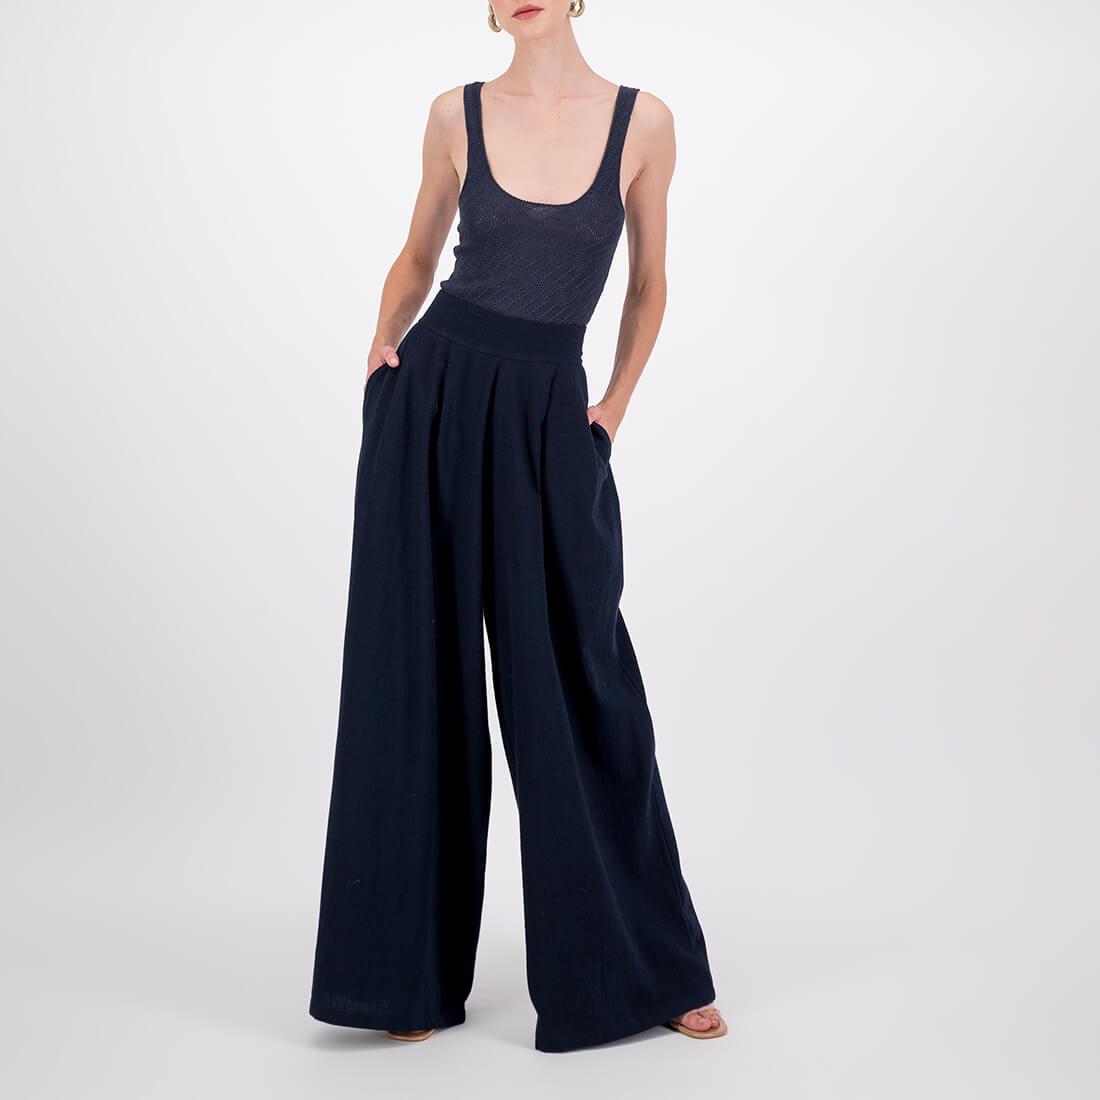 High-waisted pants 2